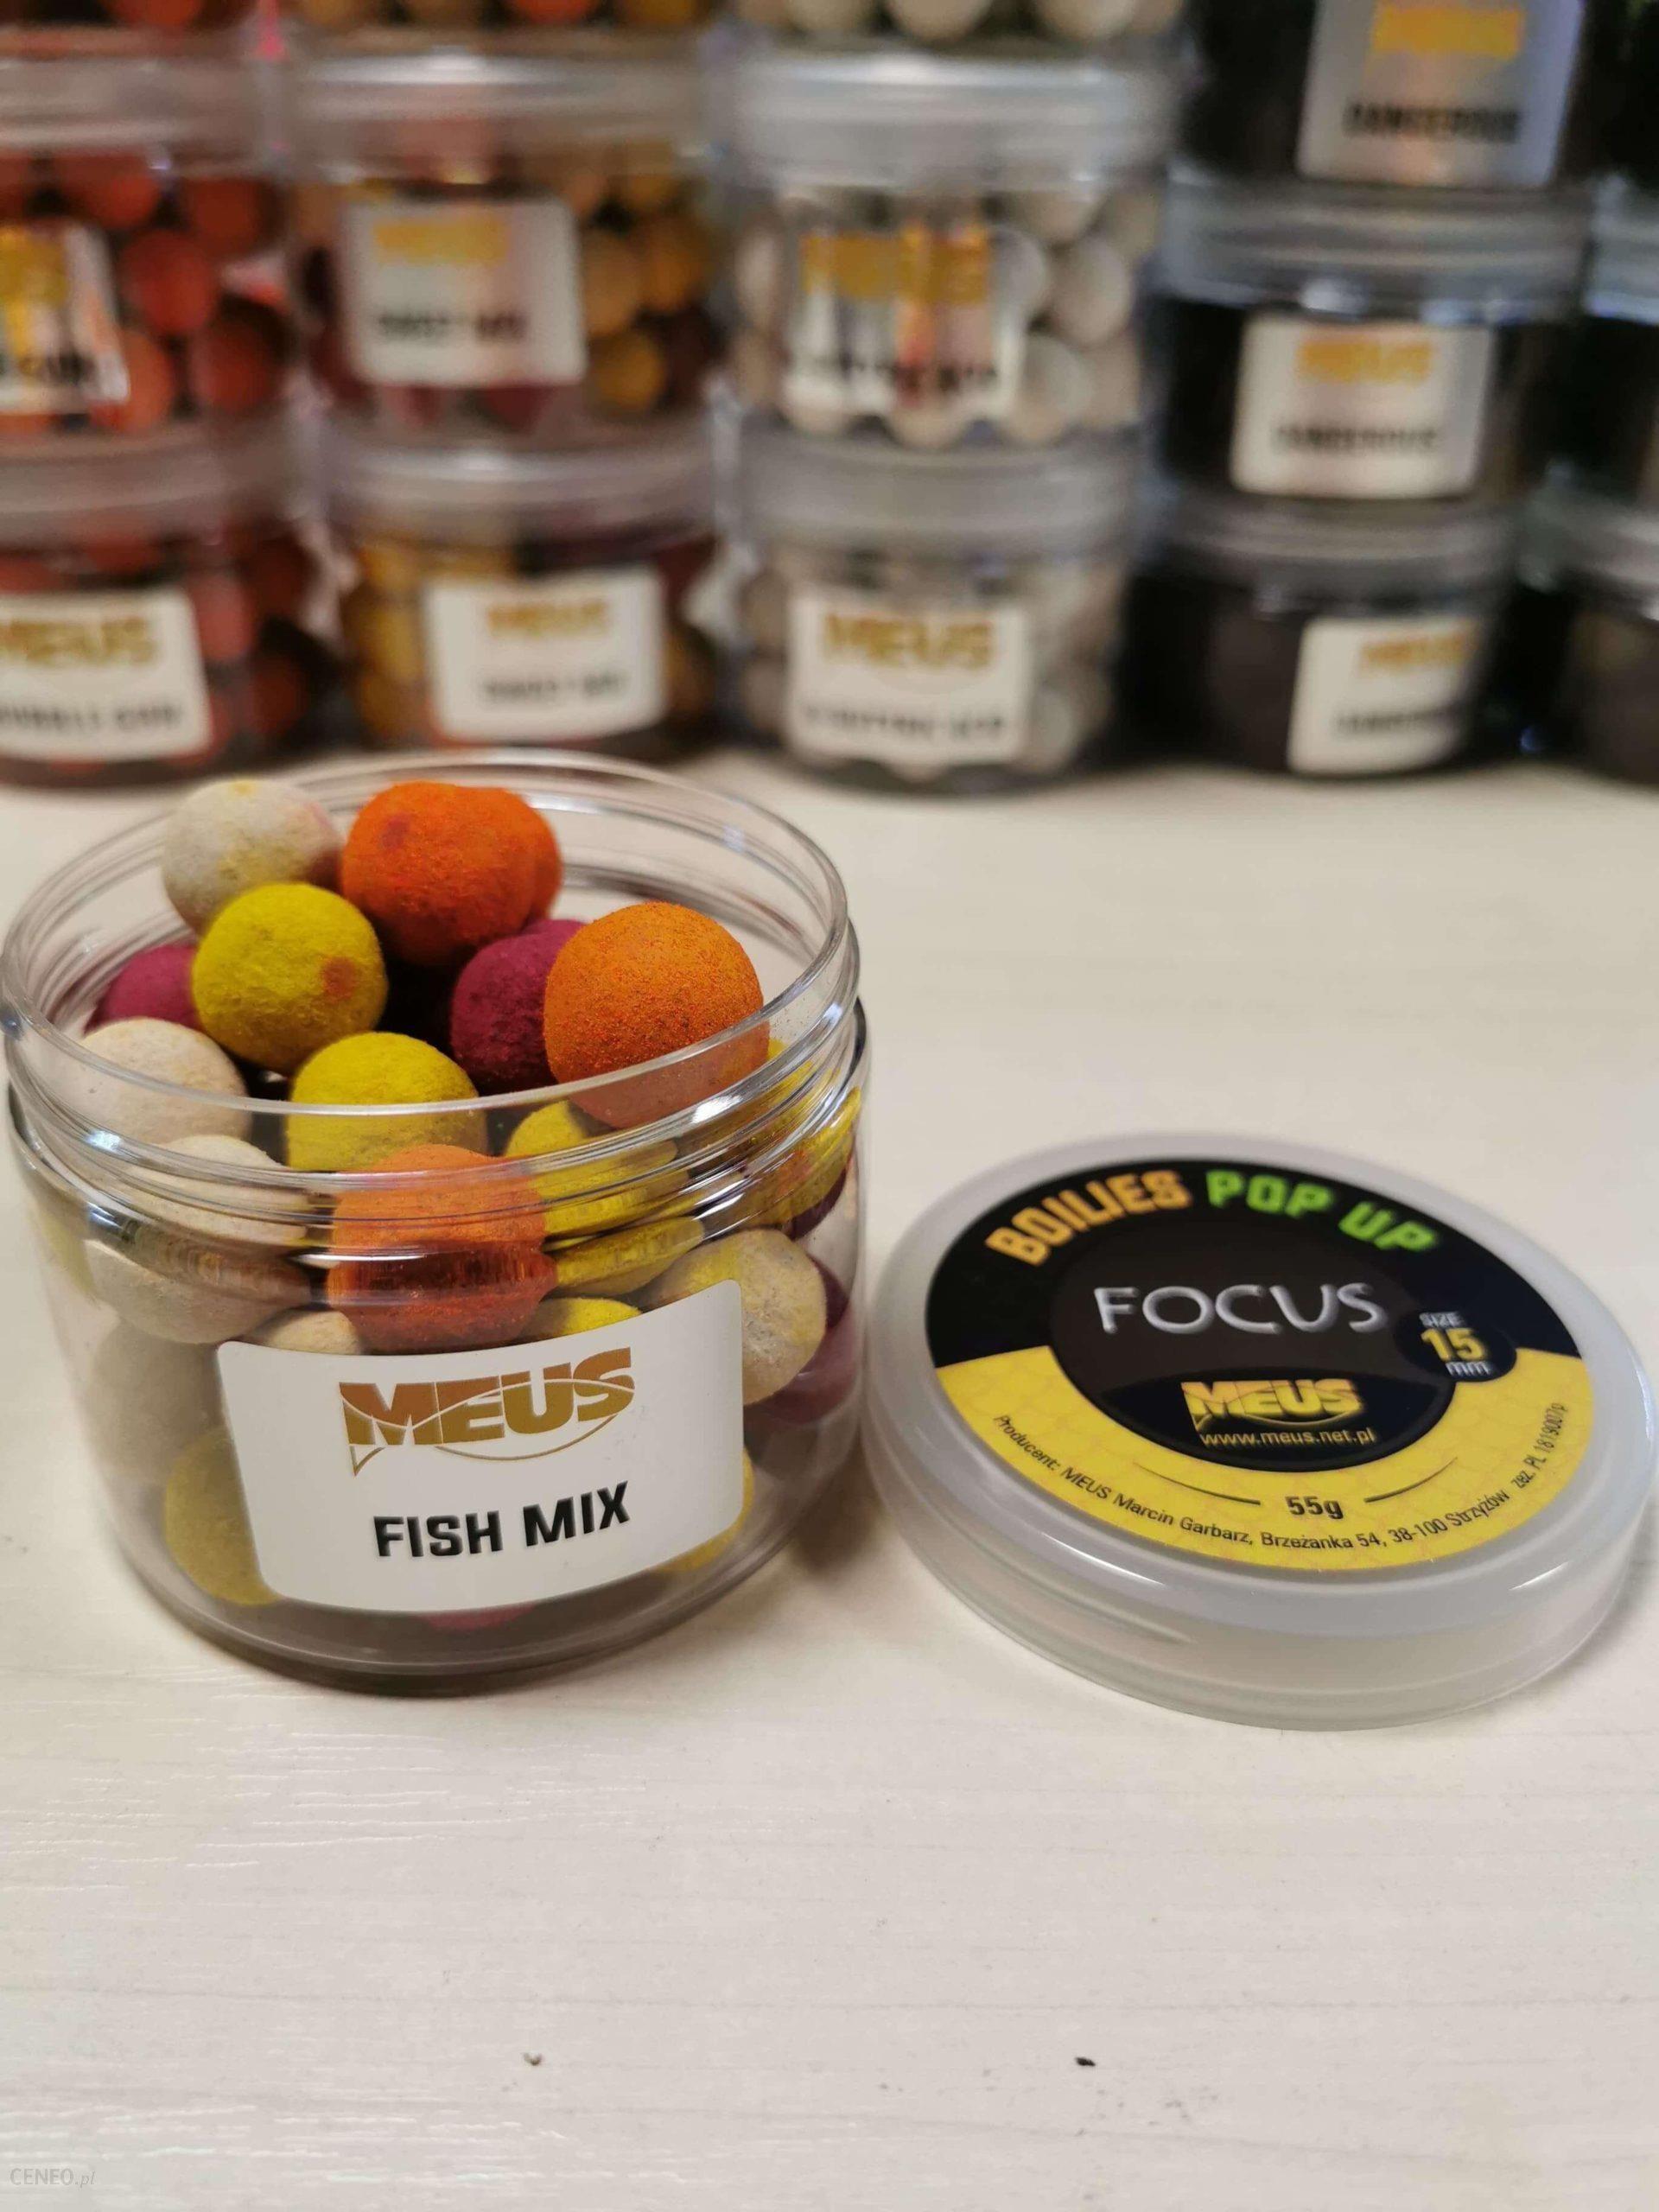 Meus Kulki Pop Up Focus 15Mm Fish Mix